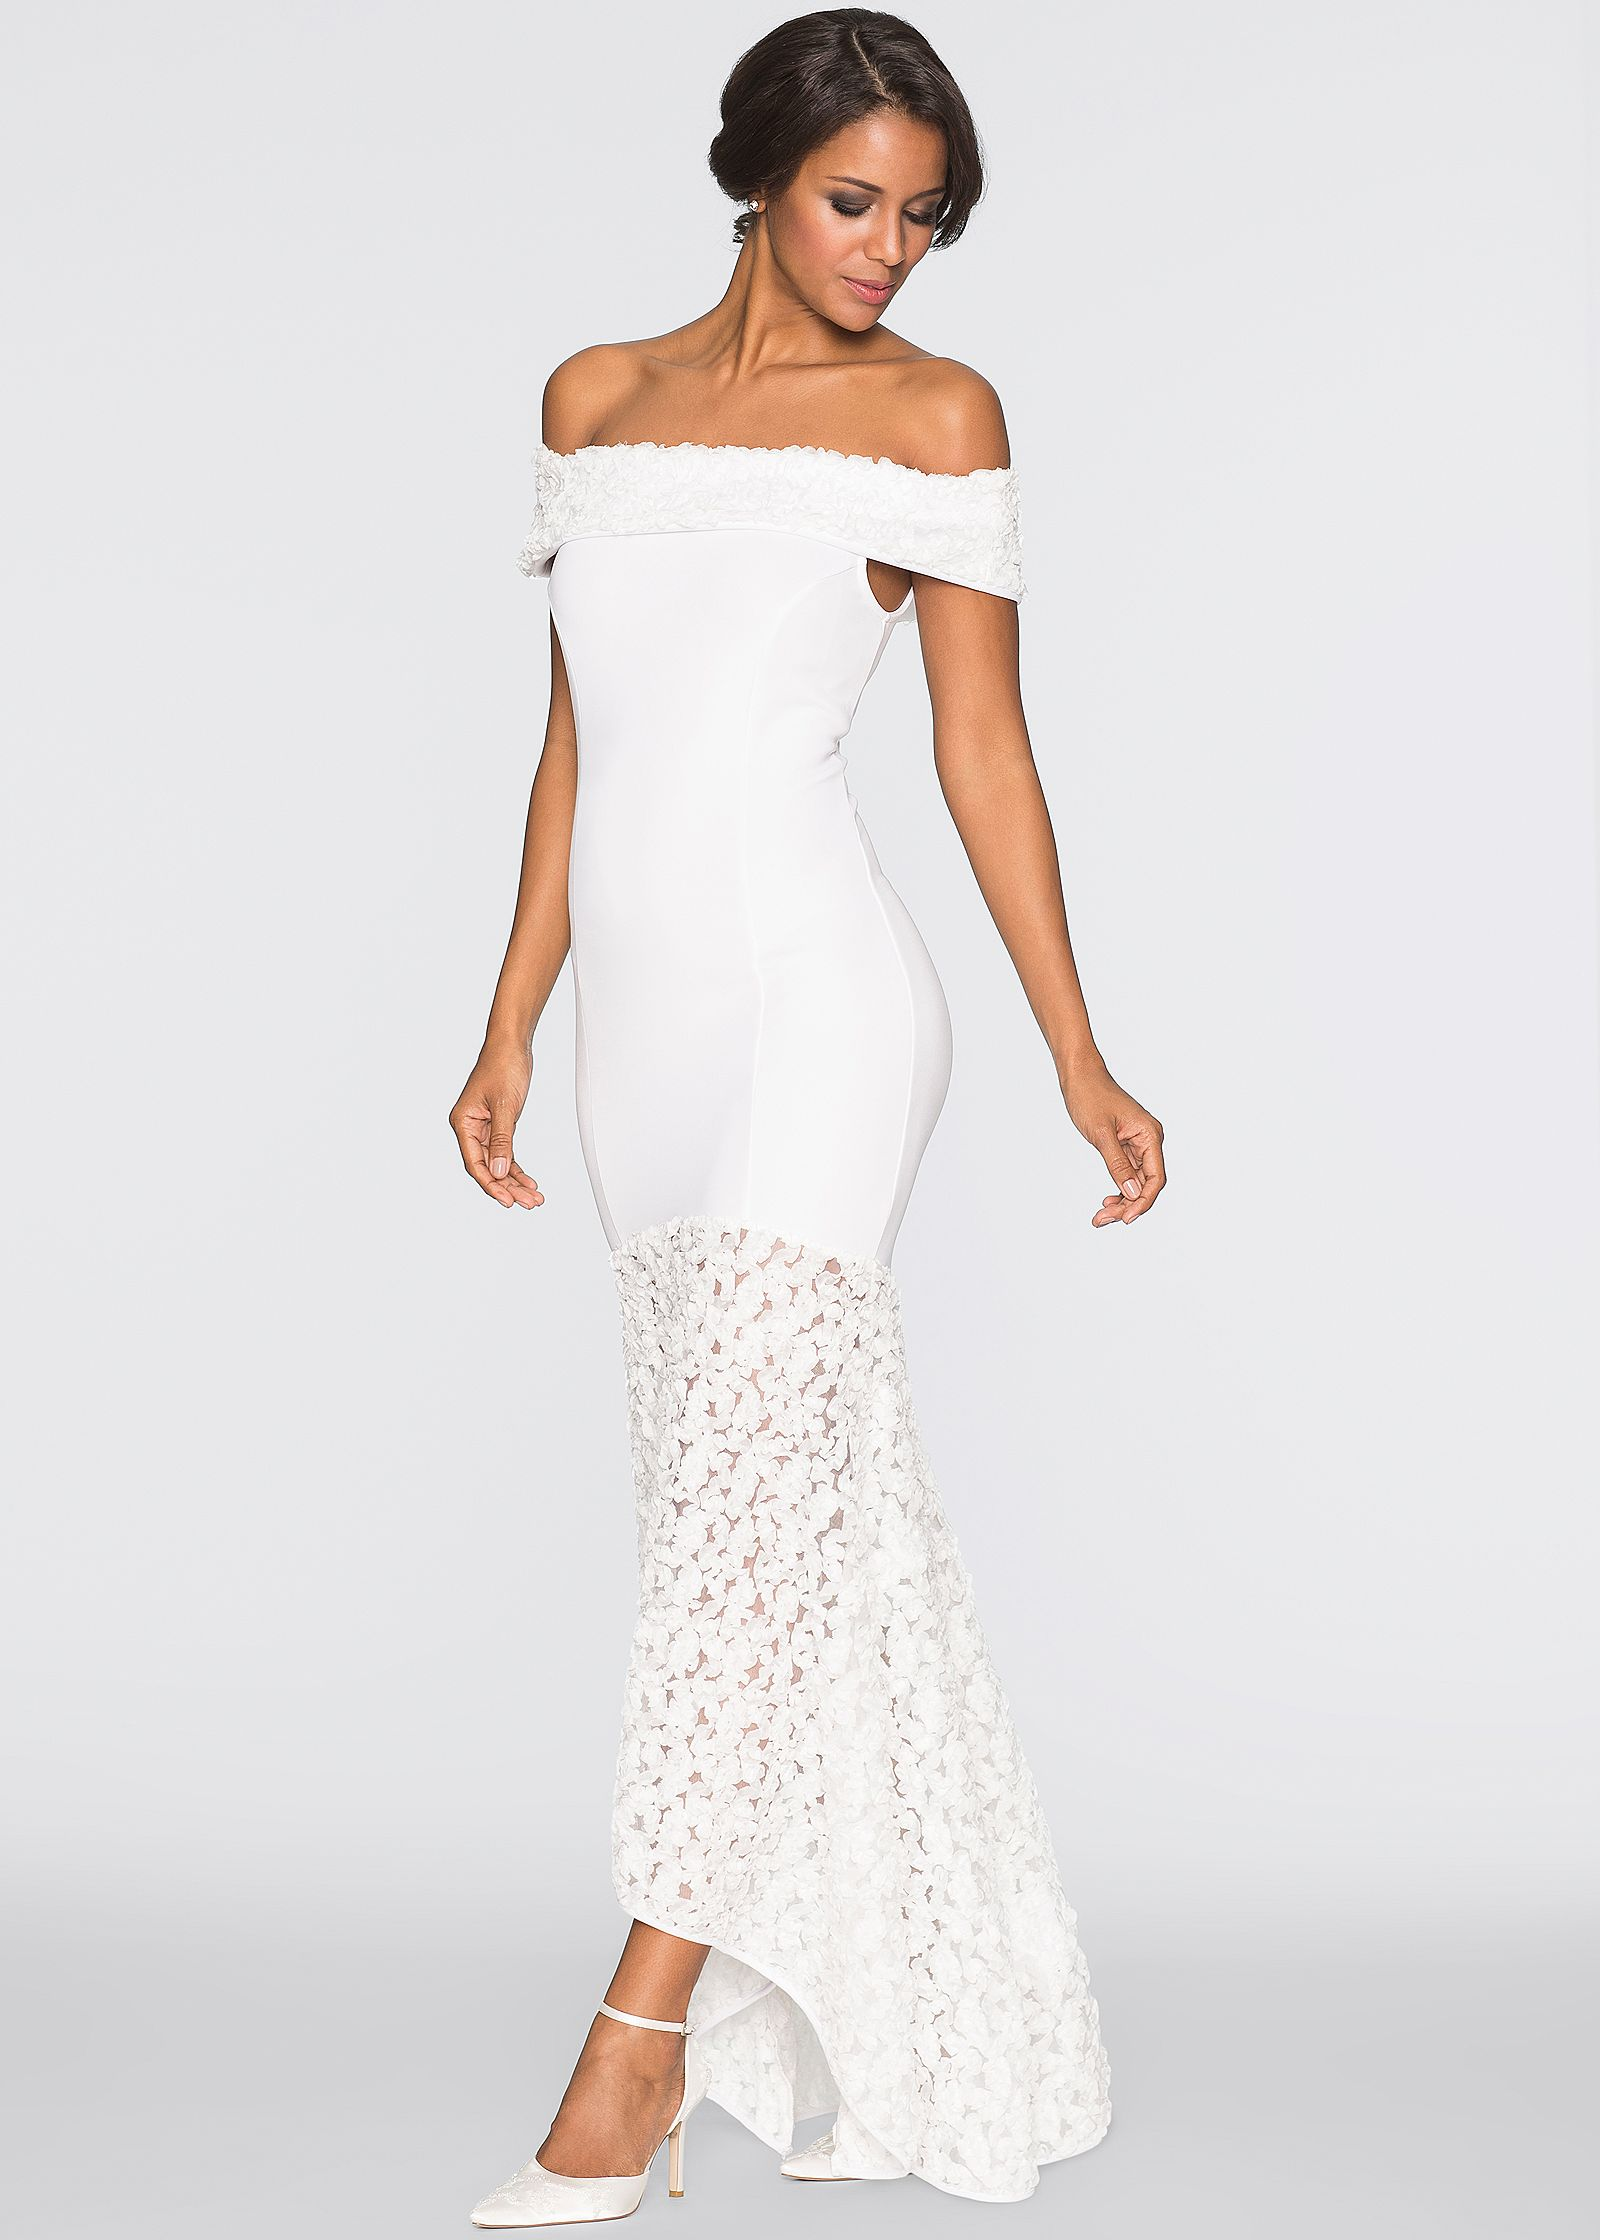 Sweater Wedding Dress 36 Marvelous STRAPLESS WEDDING DRESS